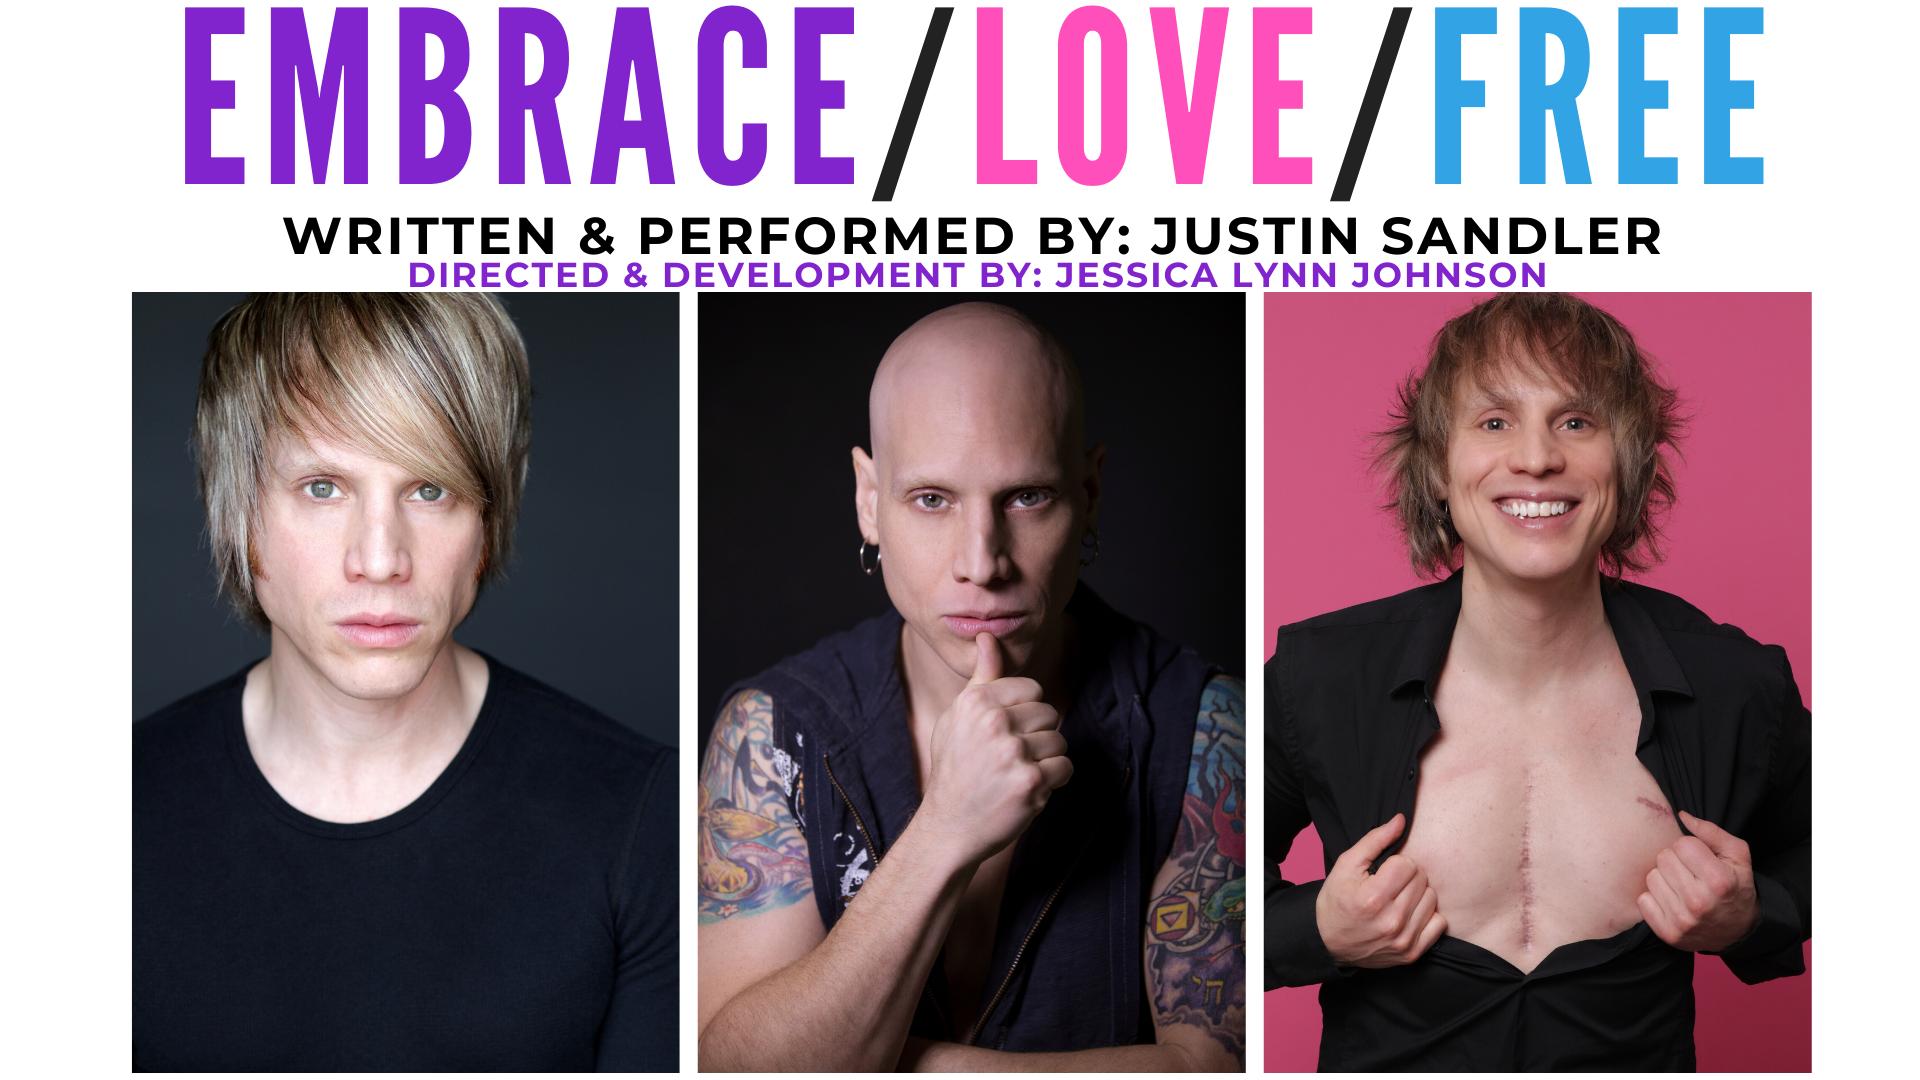 Embrace Love Free Feb 25 @ 6pm PST